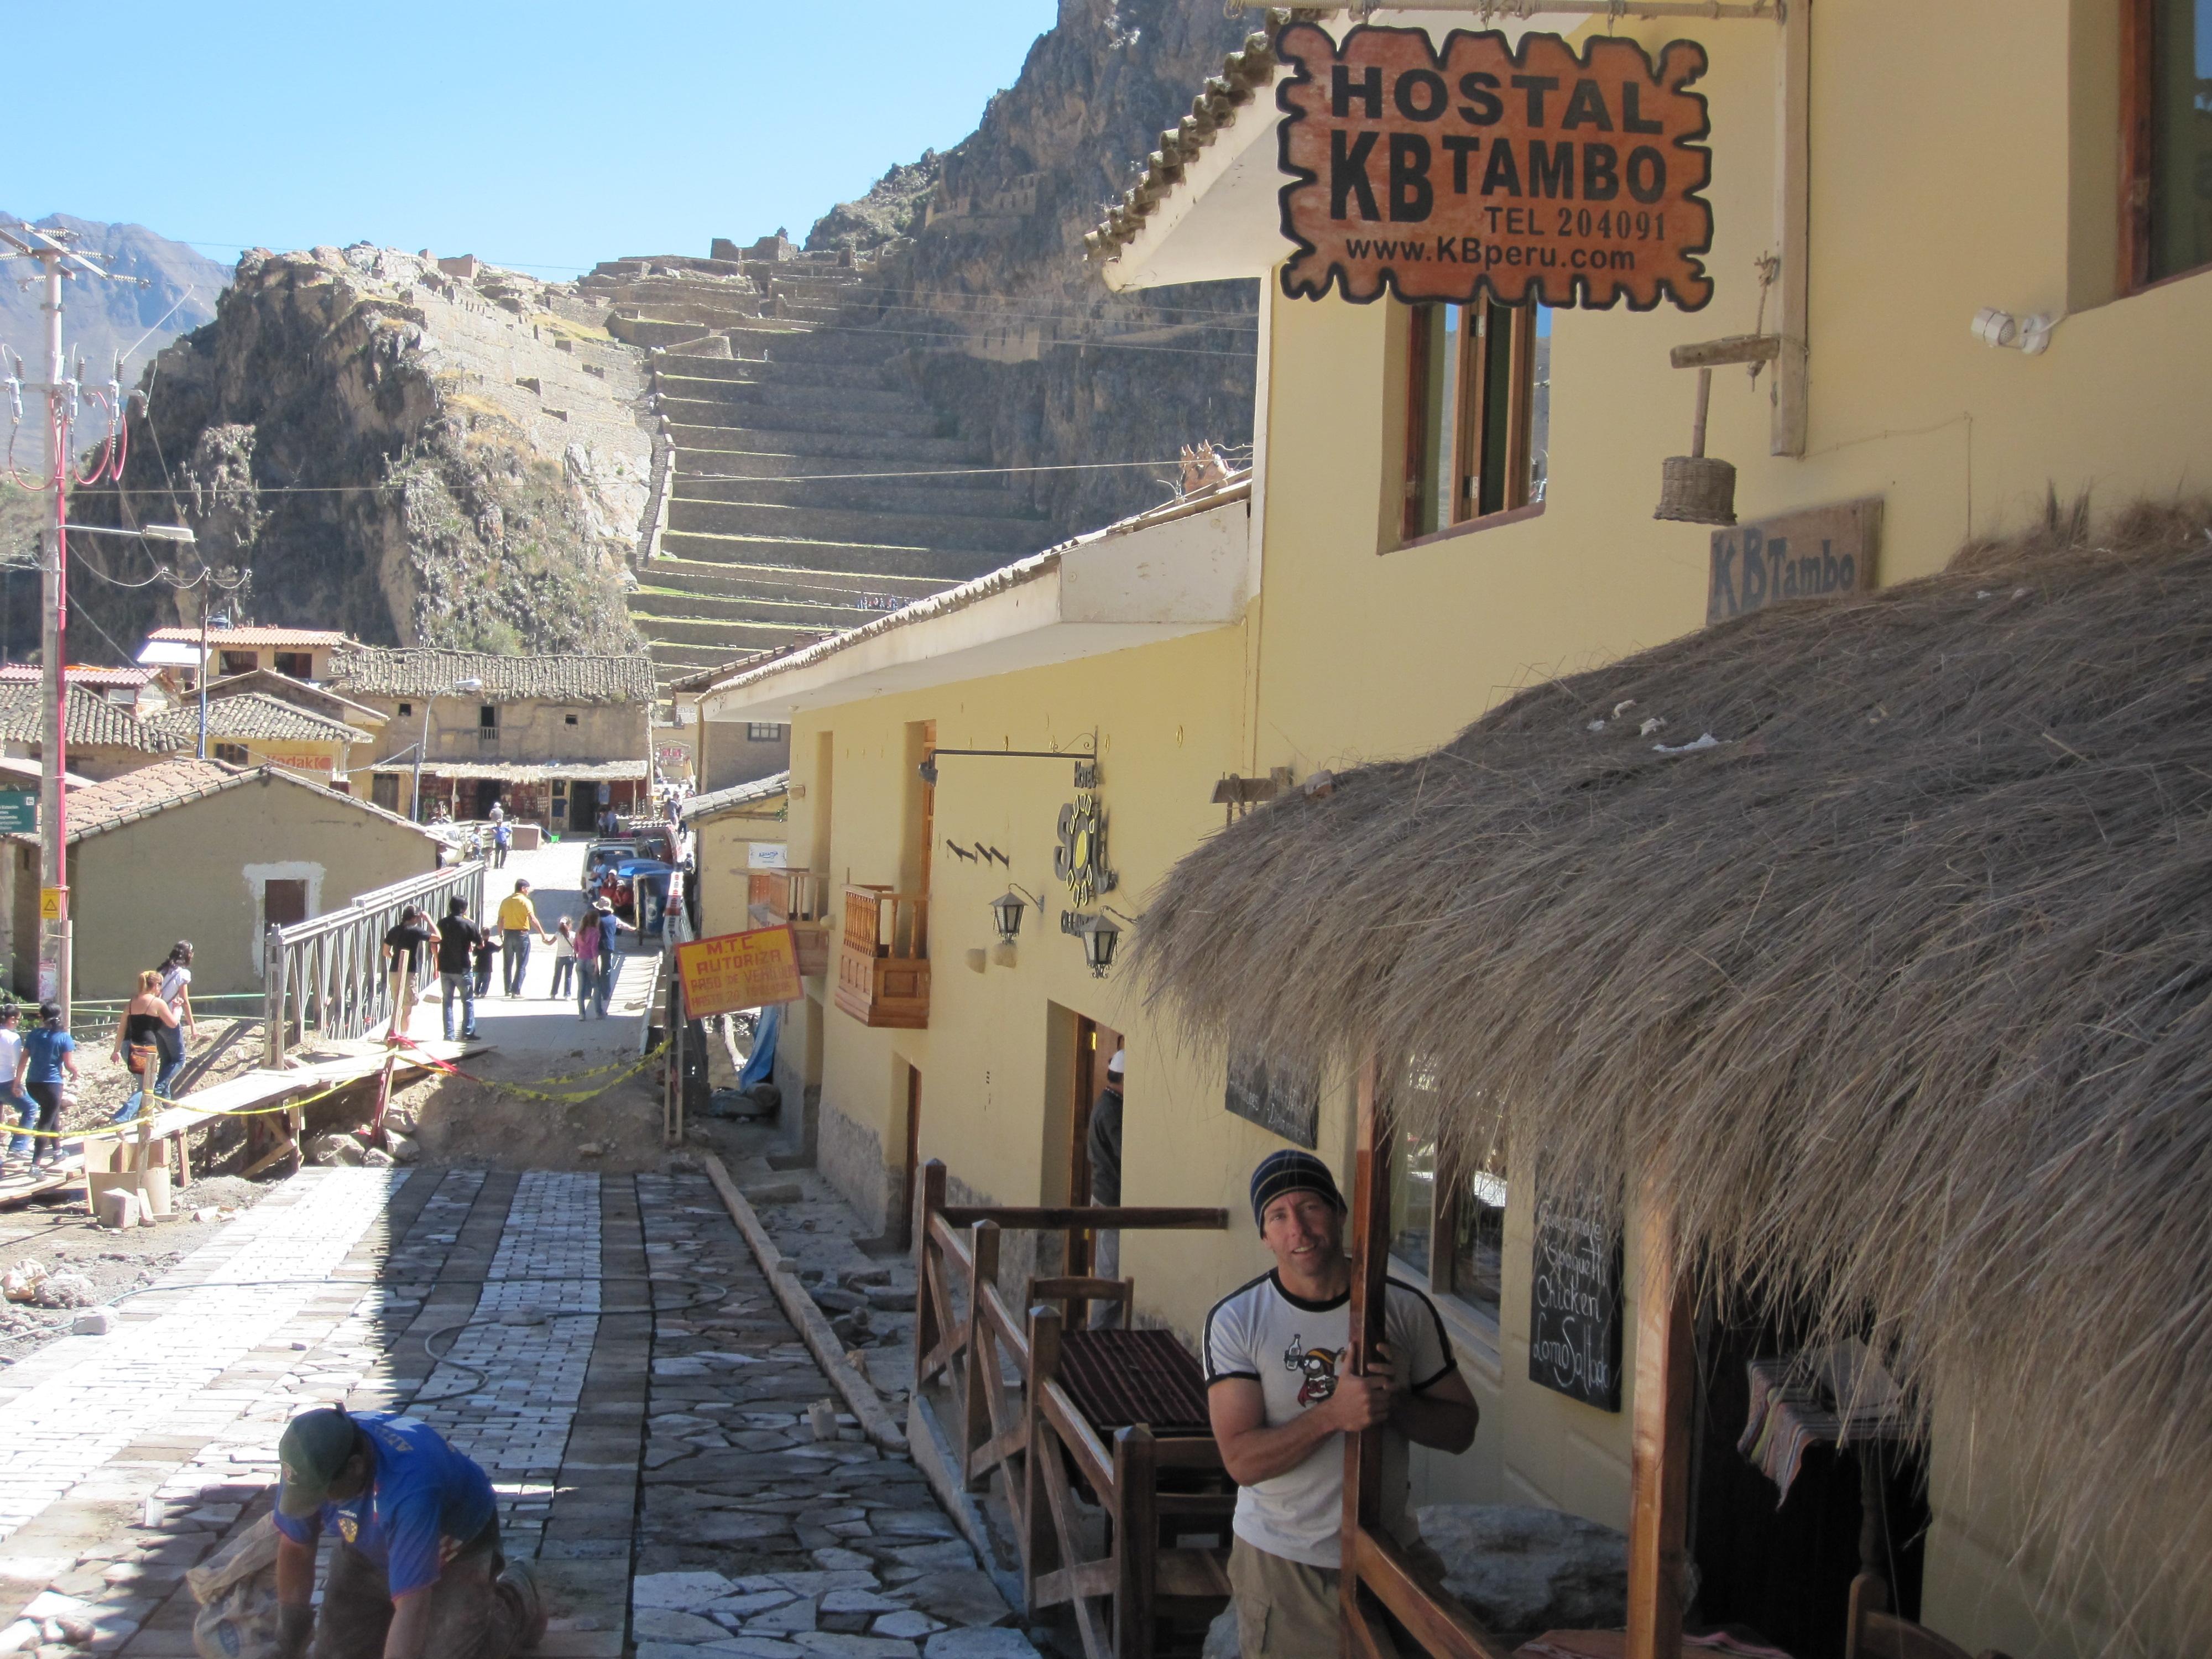 Hostal, hostals, hotel, hotels, Ollantaytambo, peru, Machu Picchu